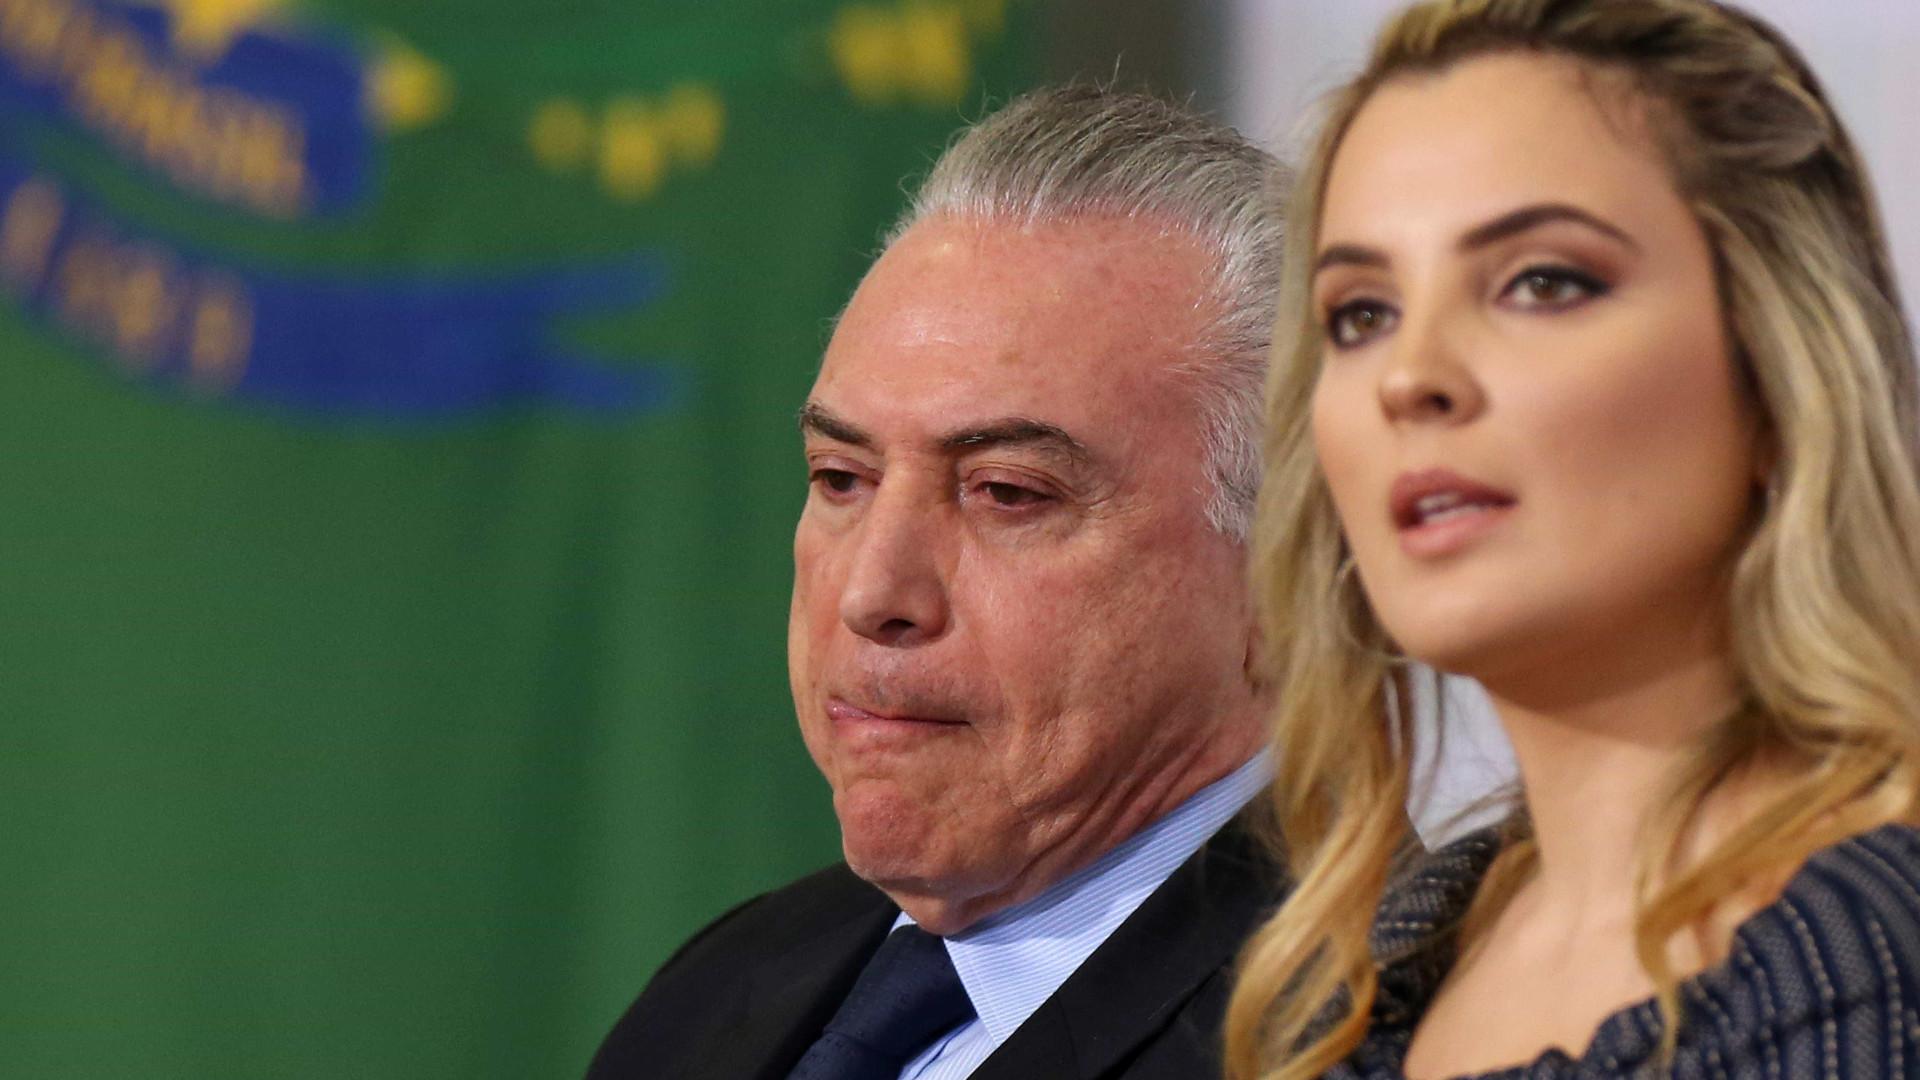 Palácio do Planalto confirma que Marcela Temer comprou casa de Yunes